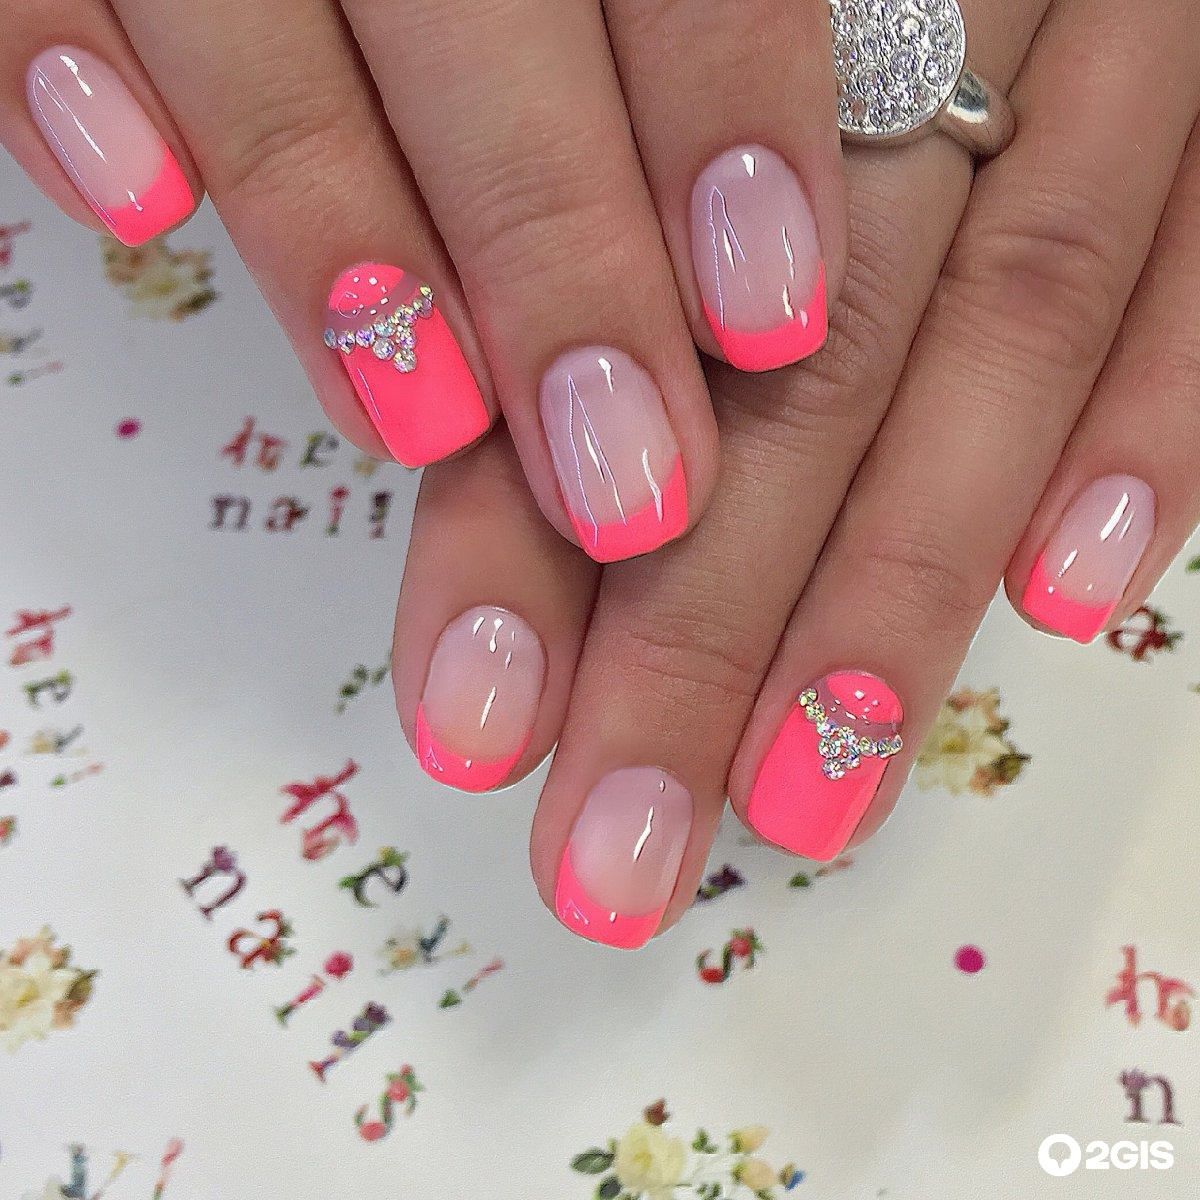 Маникюр в розовом цвете на короткие ногти фото дизайн